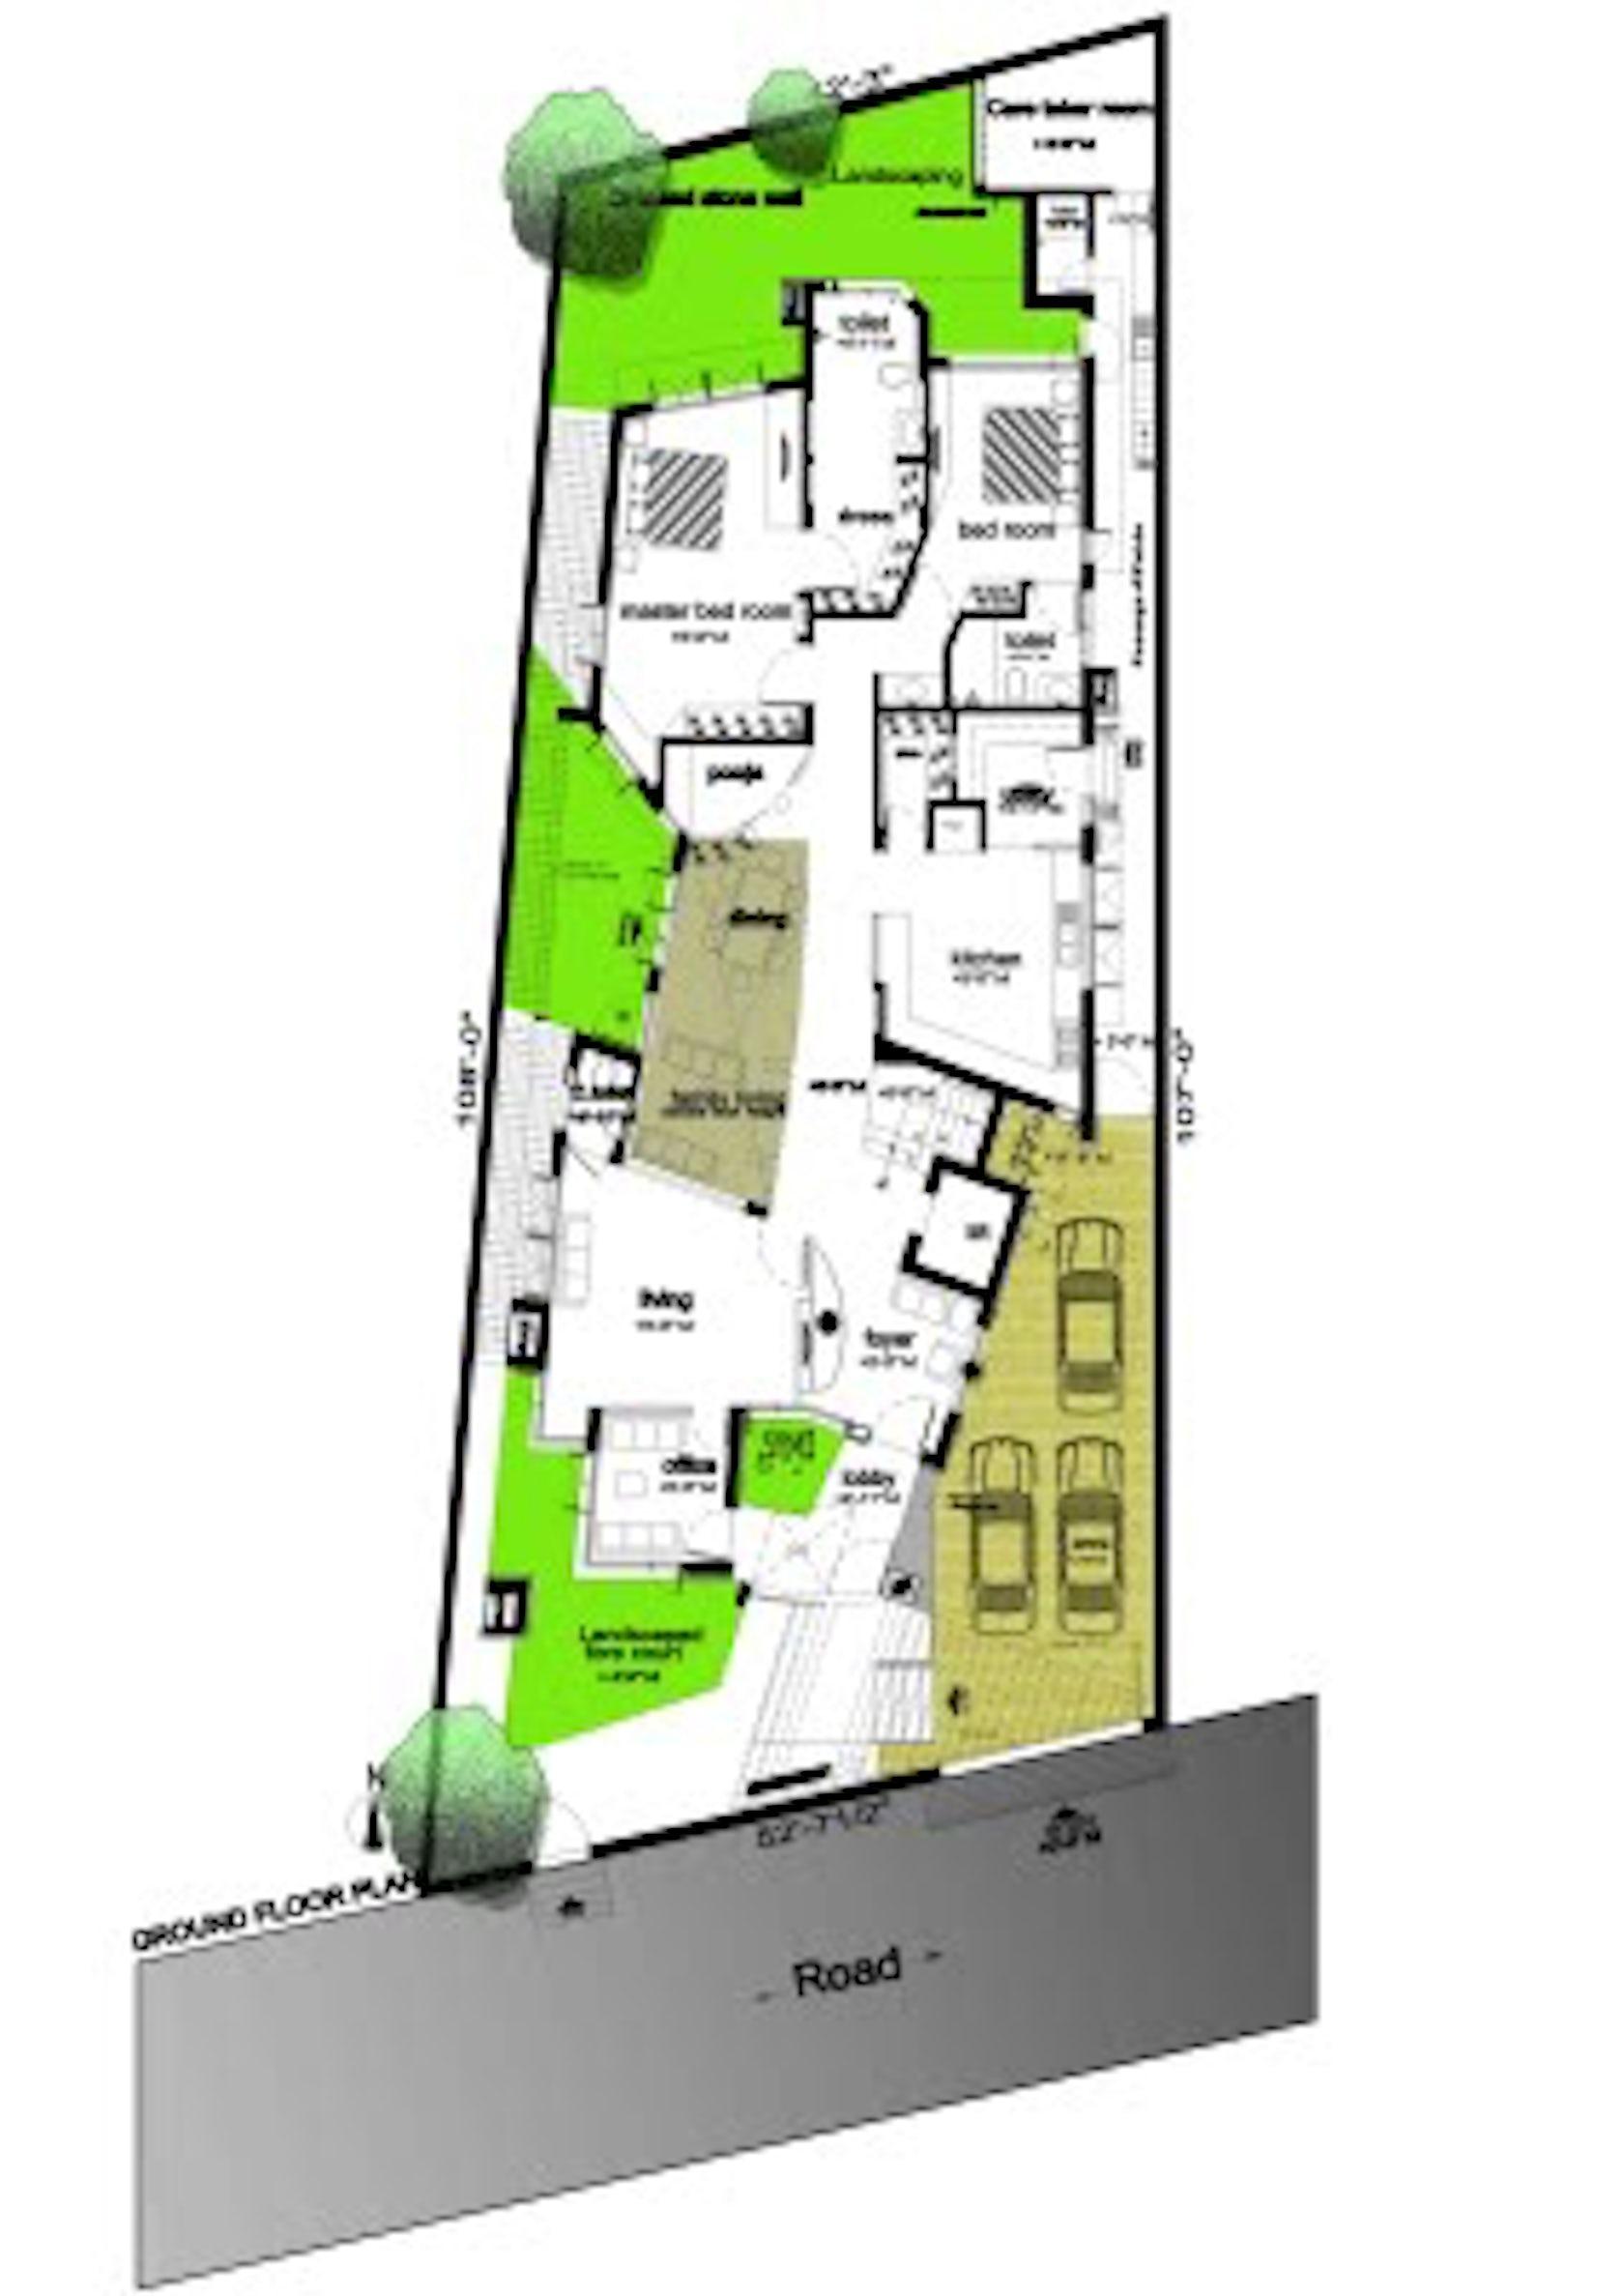 The 3g house uma suresh architizer for Architecture 3g